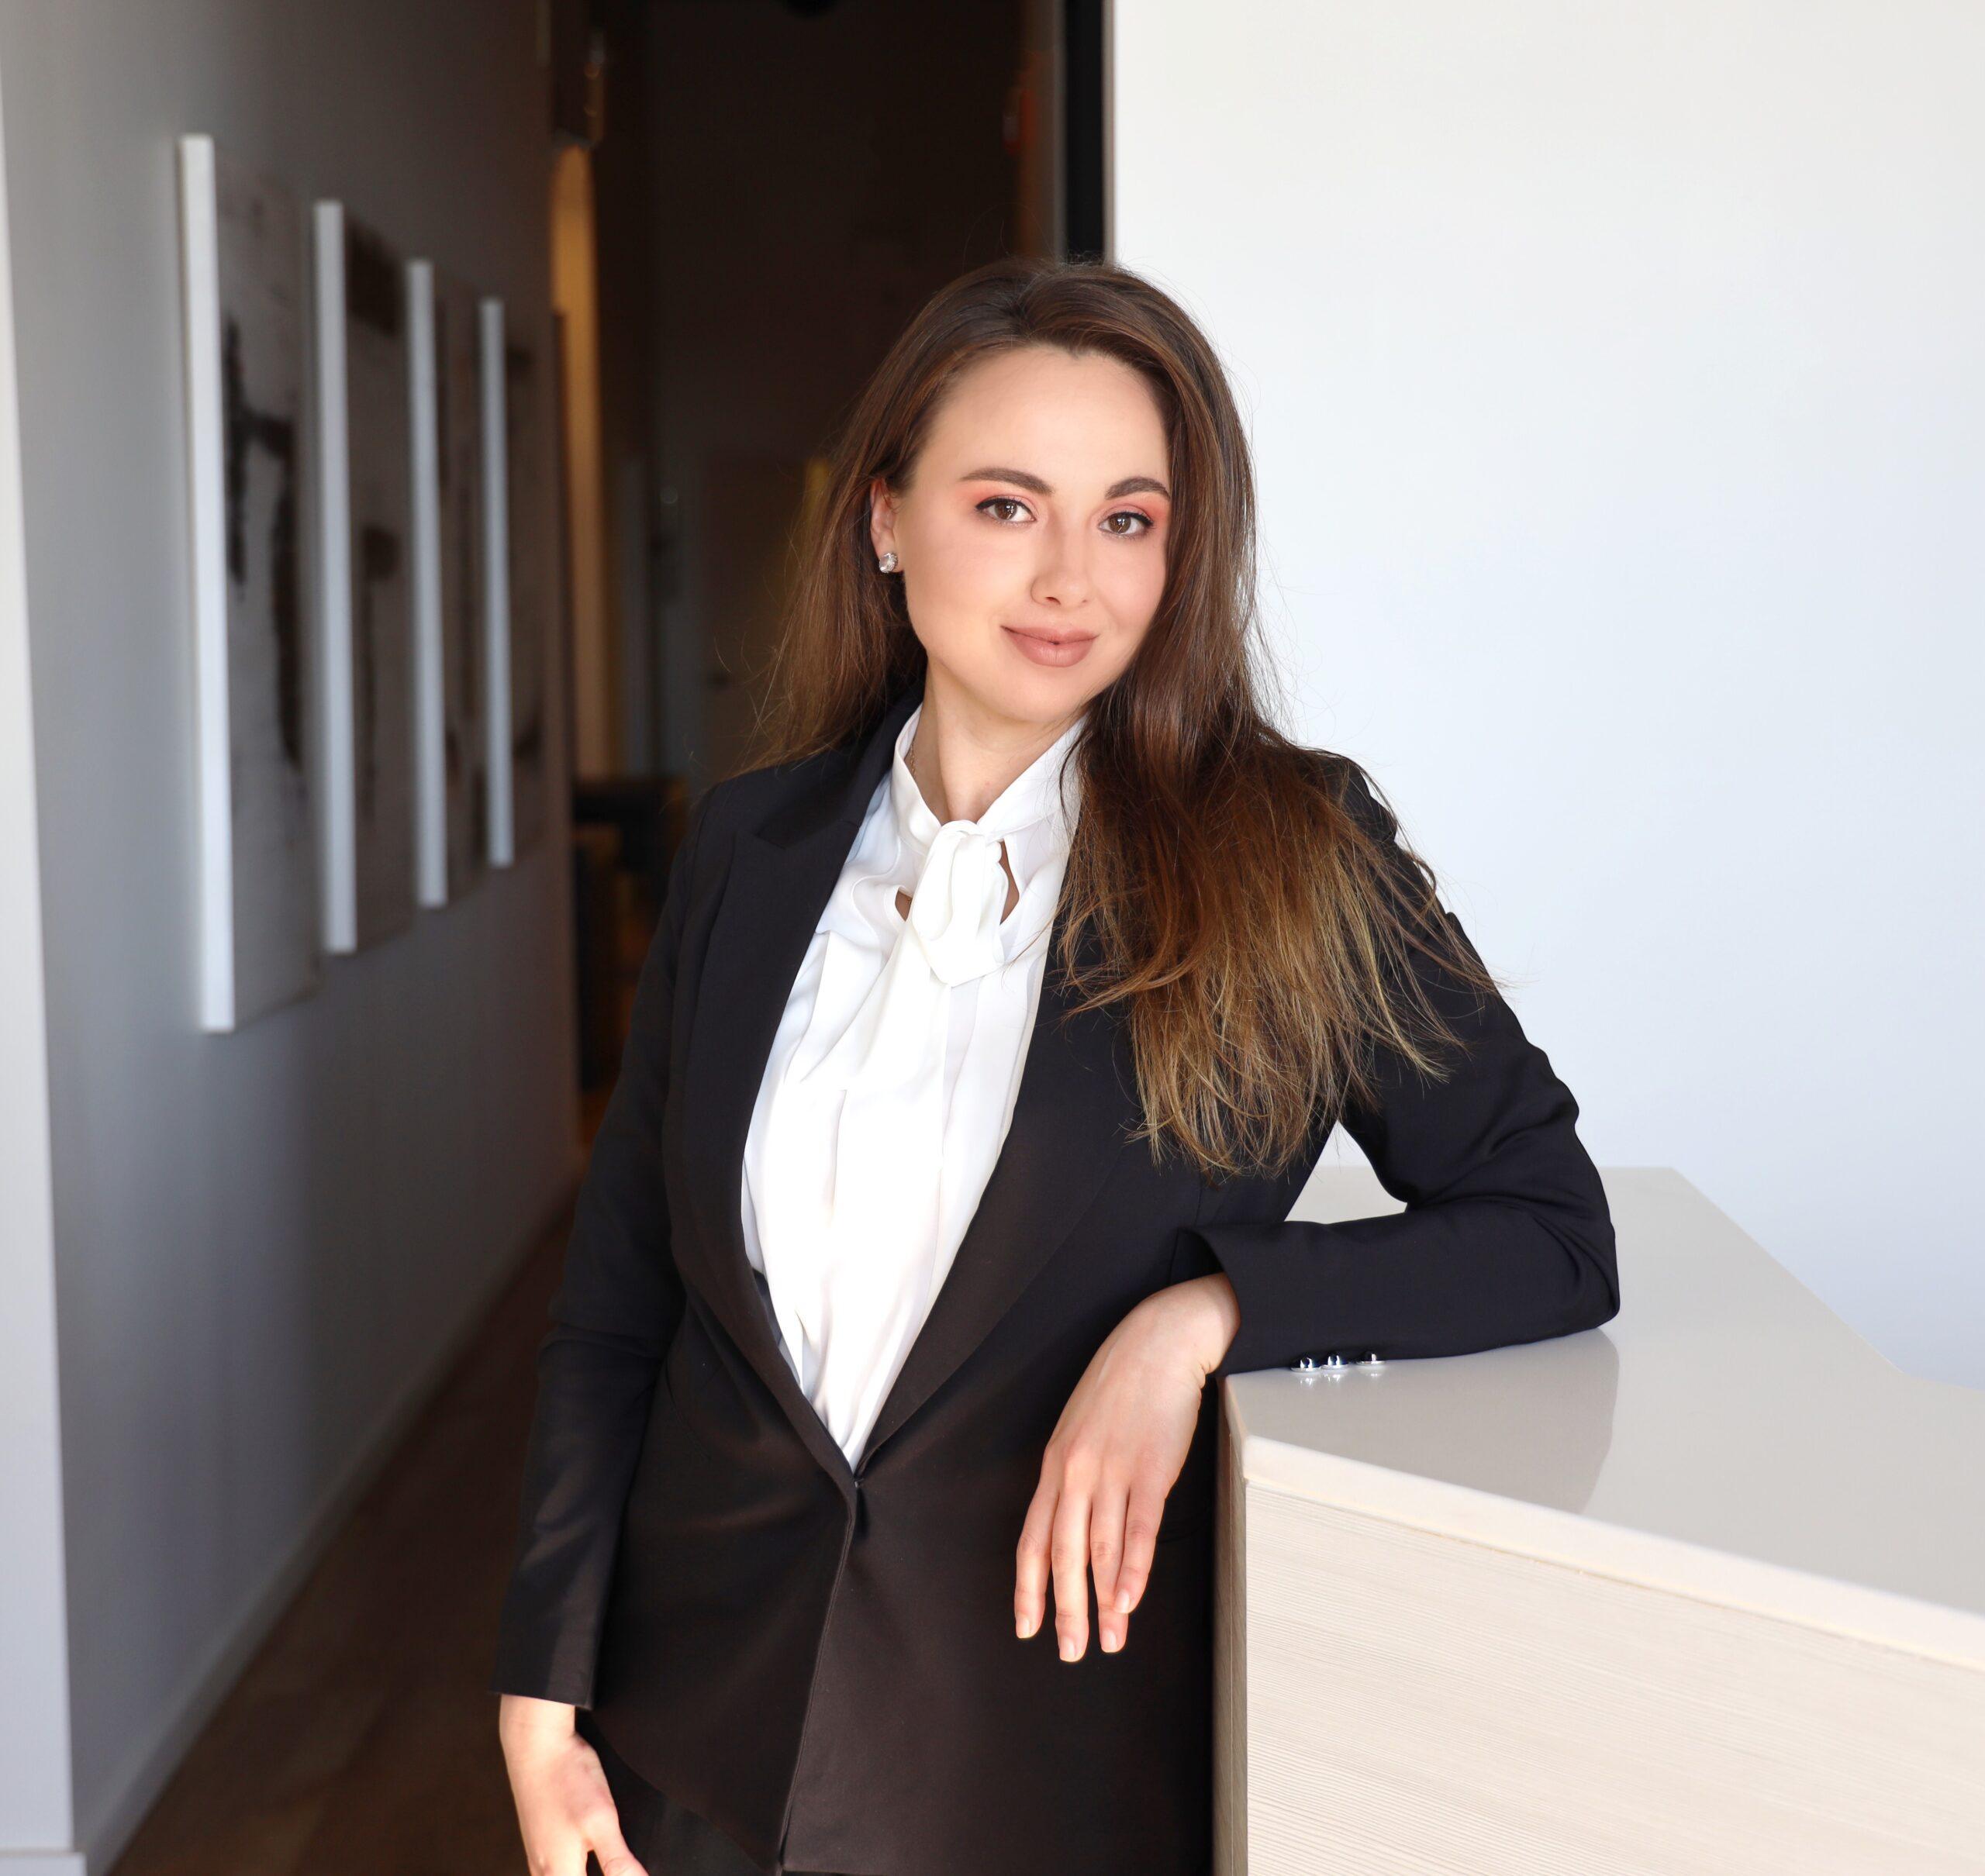 Emili Angelova